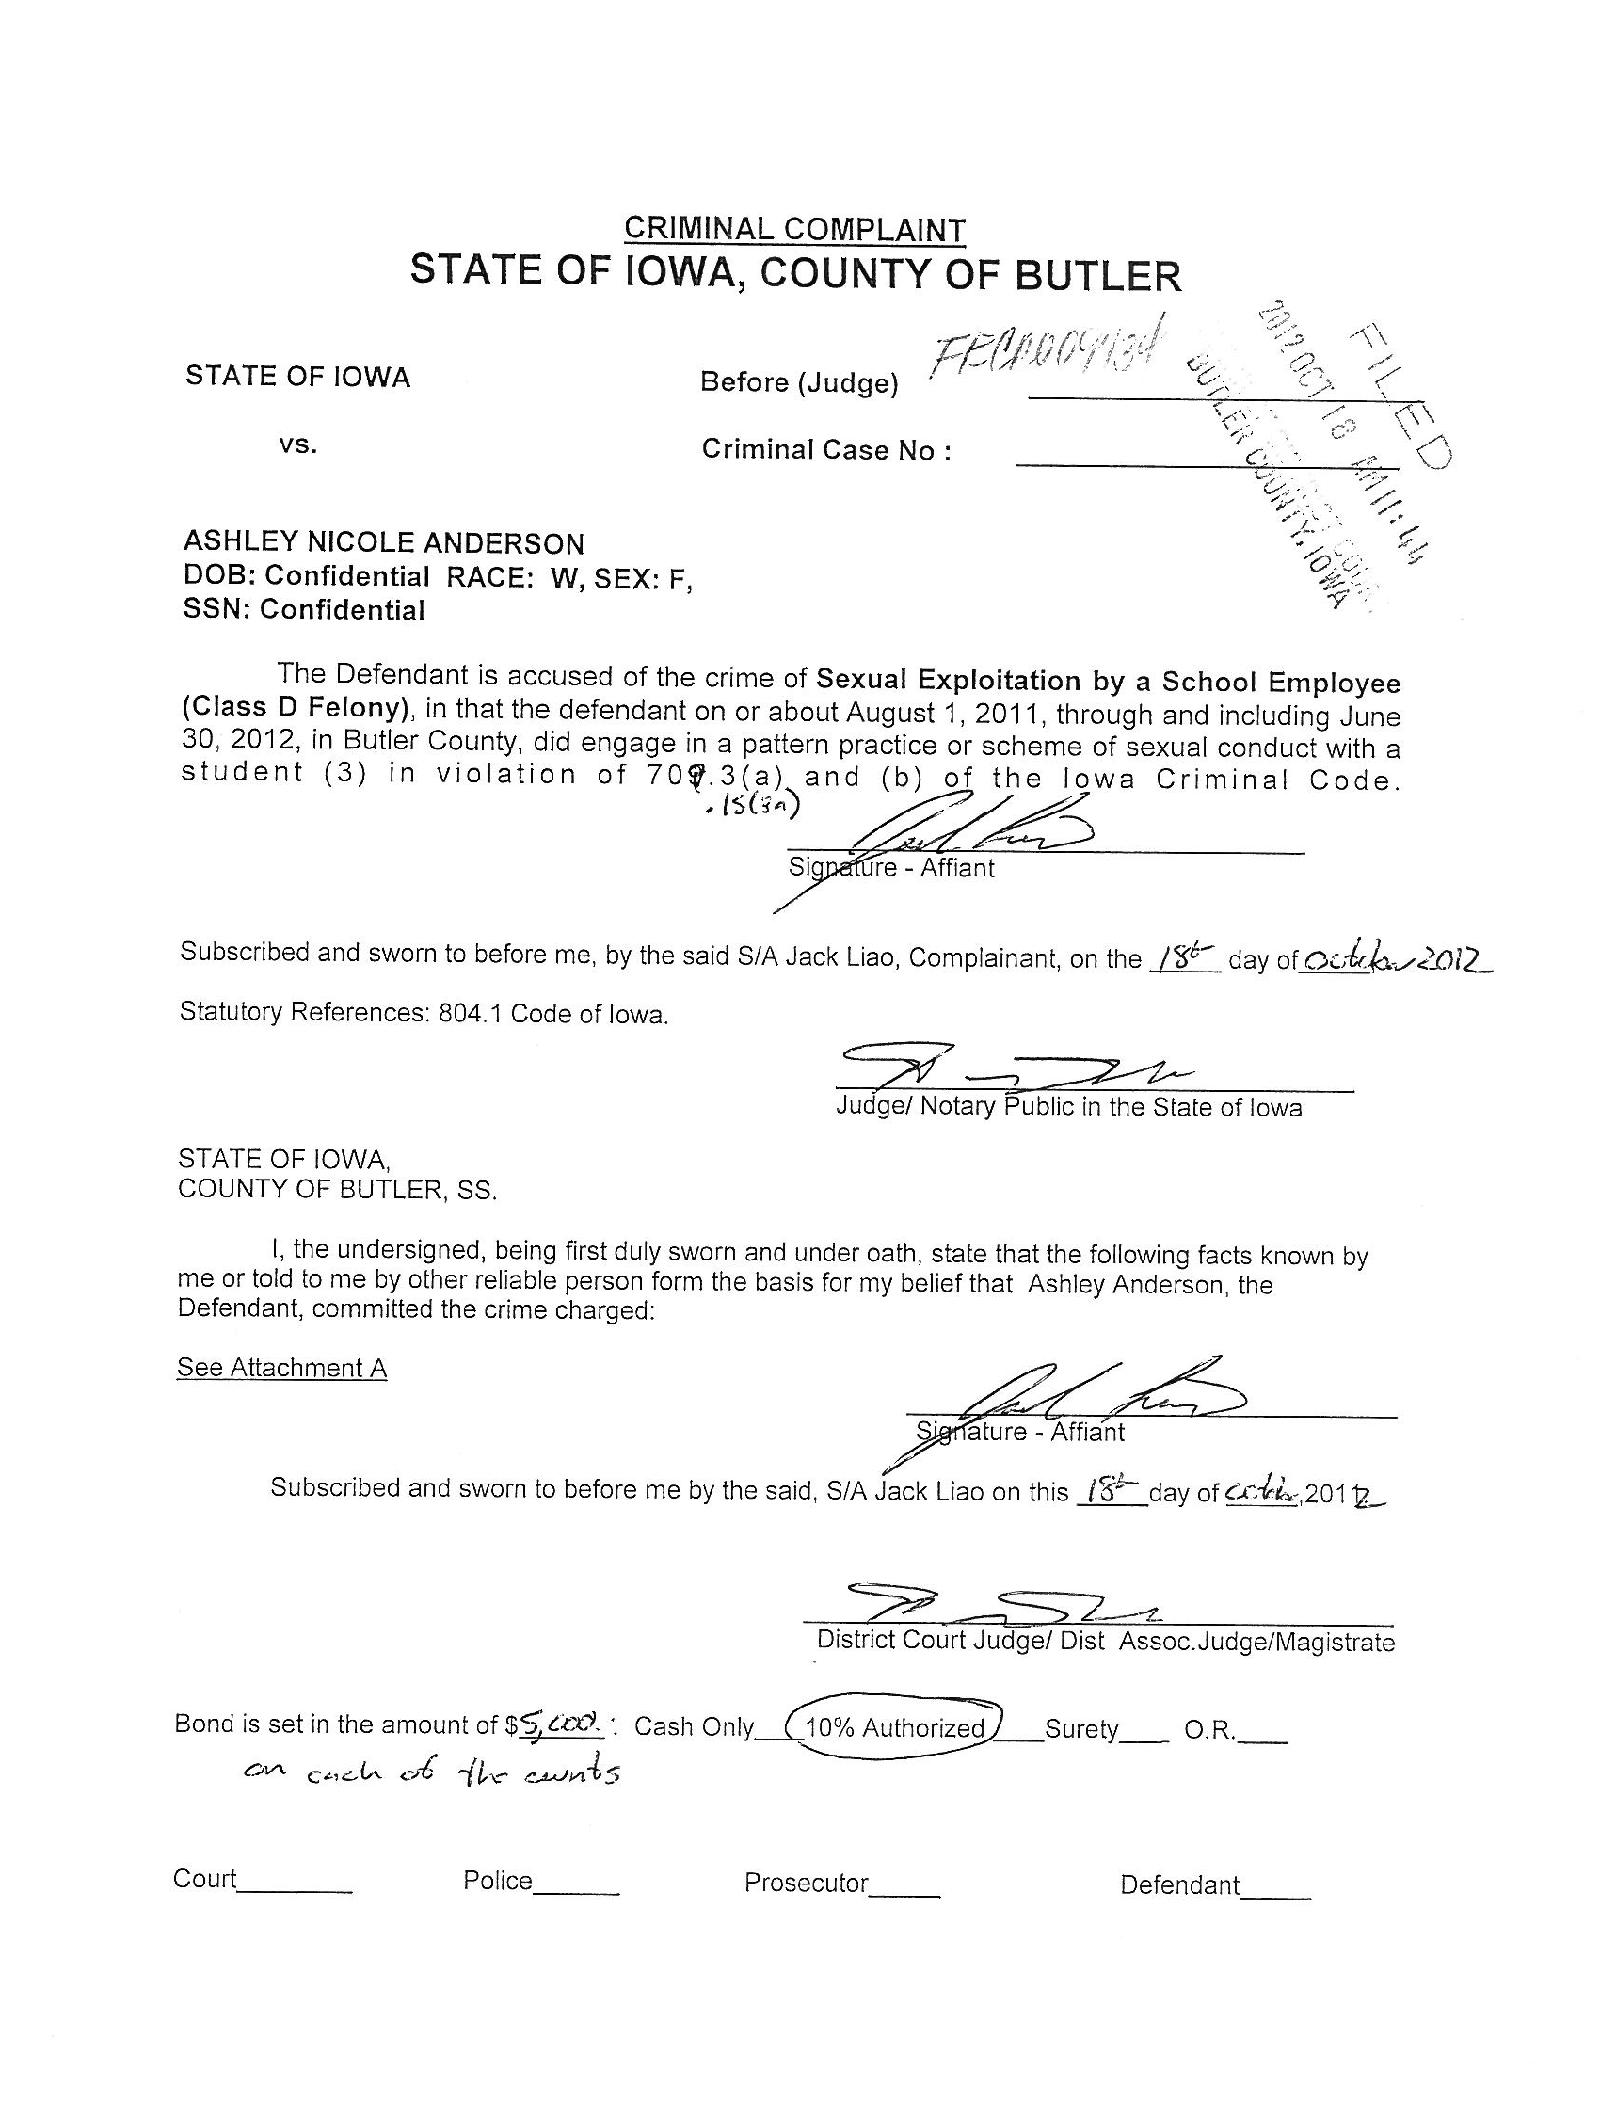 Copy of anderson ashley warrants4.png